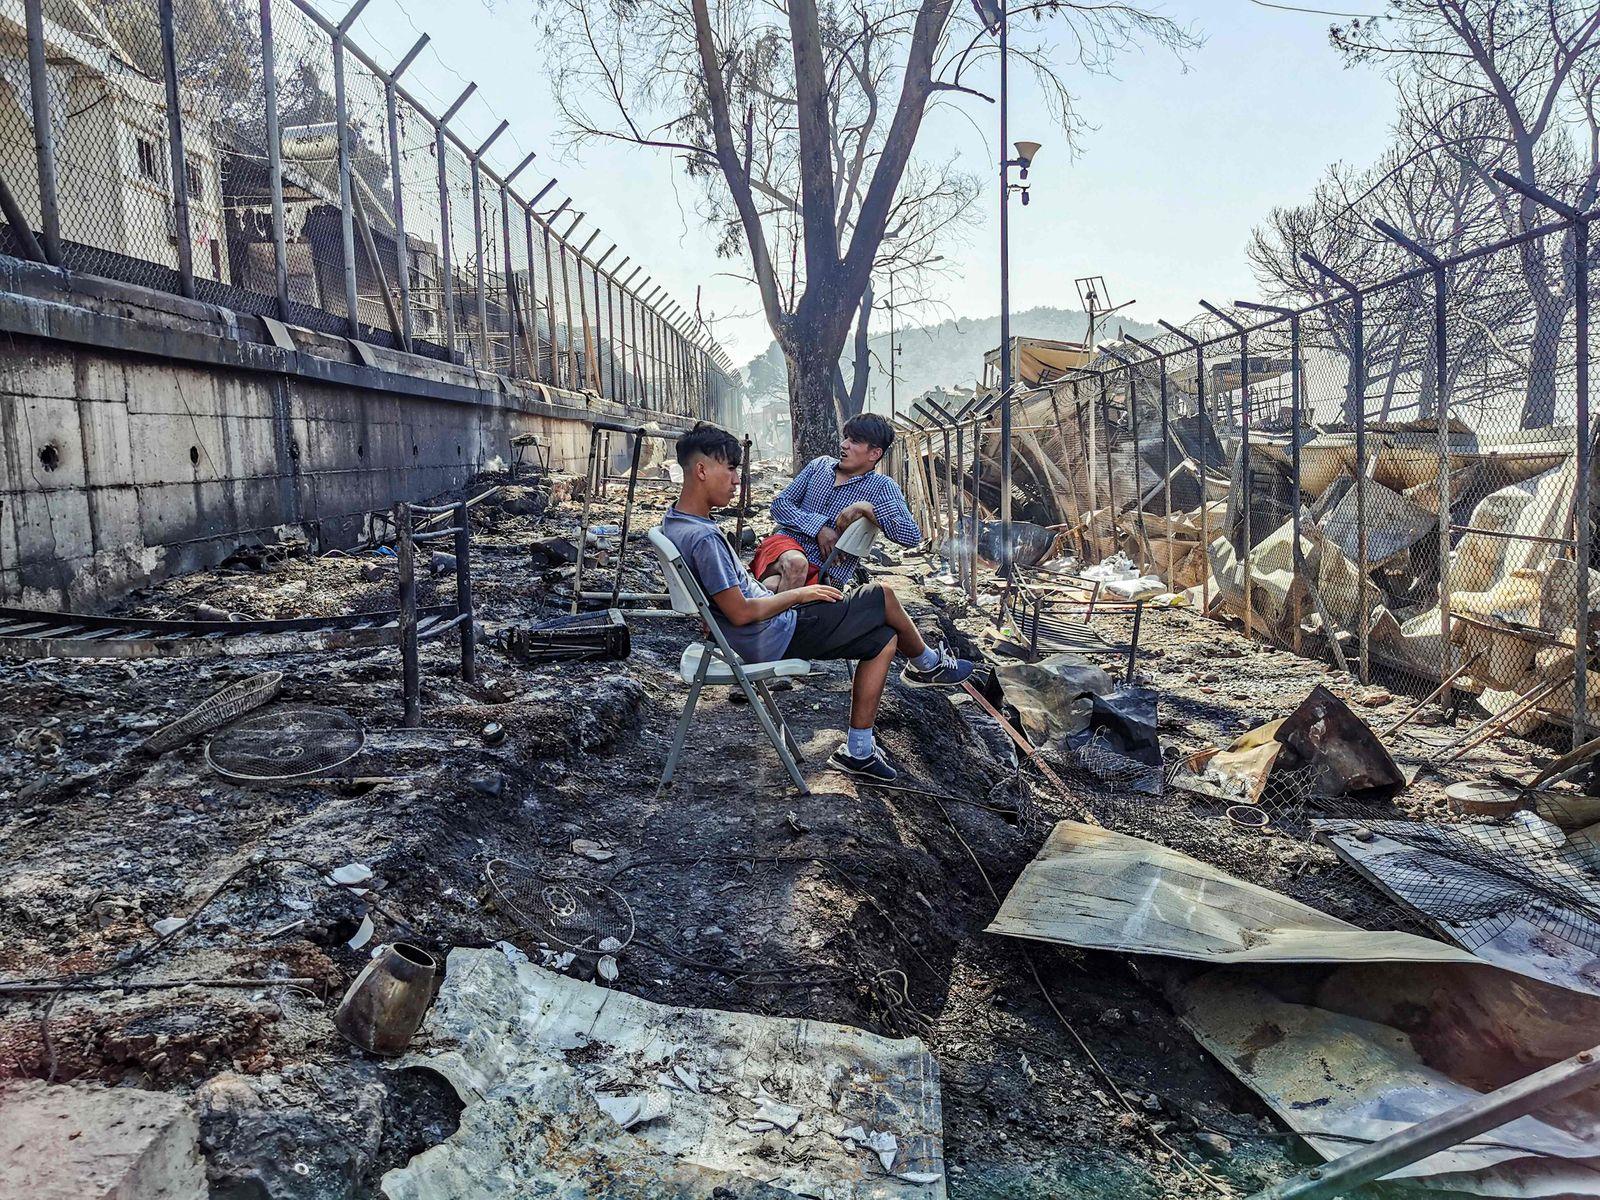 TOPSHOT-GREECE-MIGRANTS-EUROPE-CAMP-FIRE